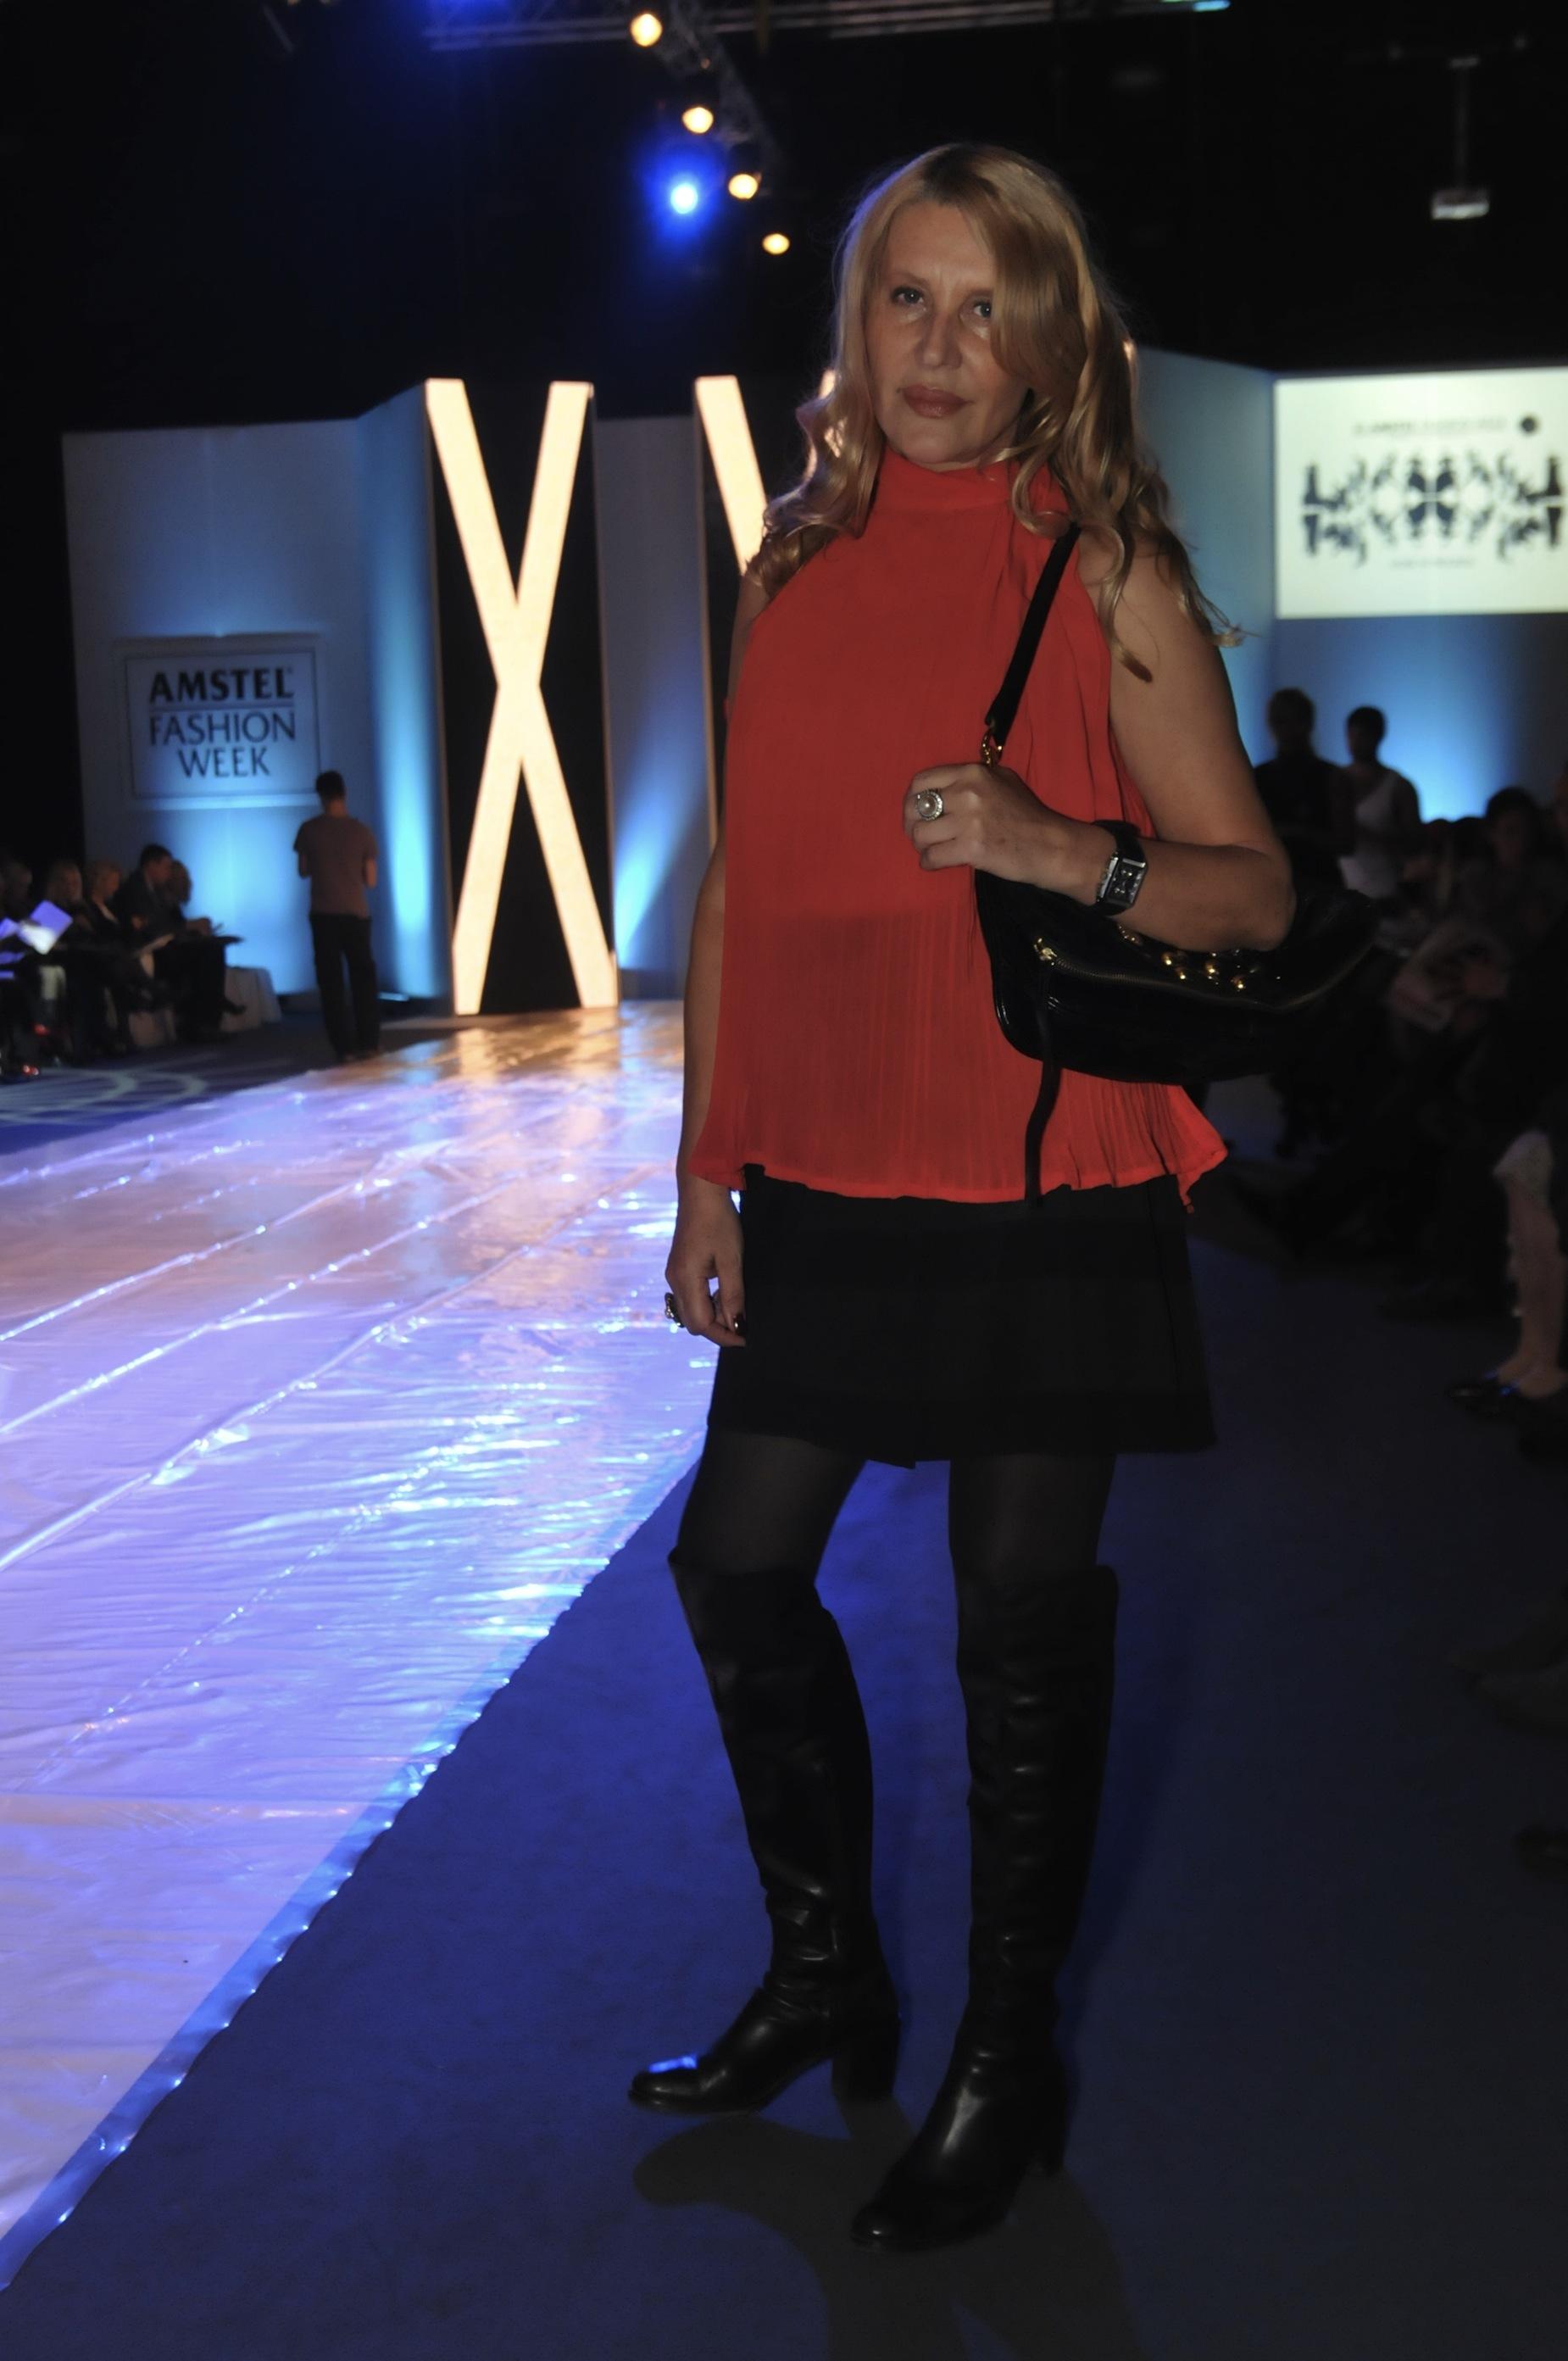 verica rakocevic Peto veče 30.Amstel Fashion Week a